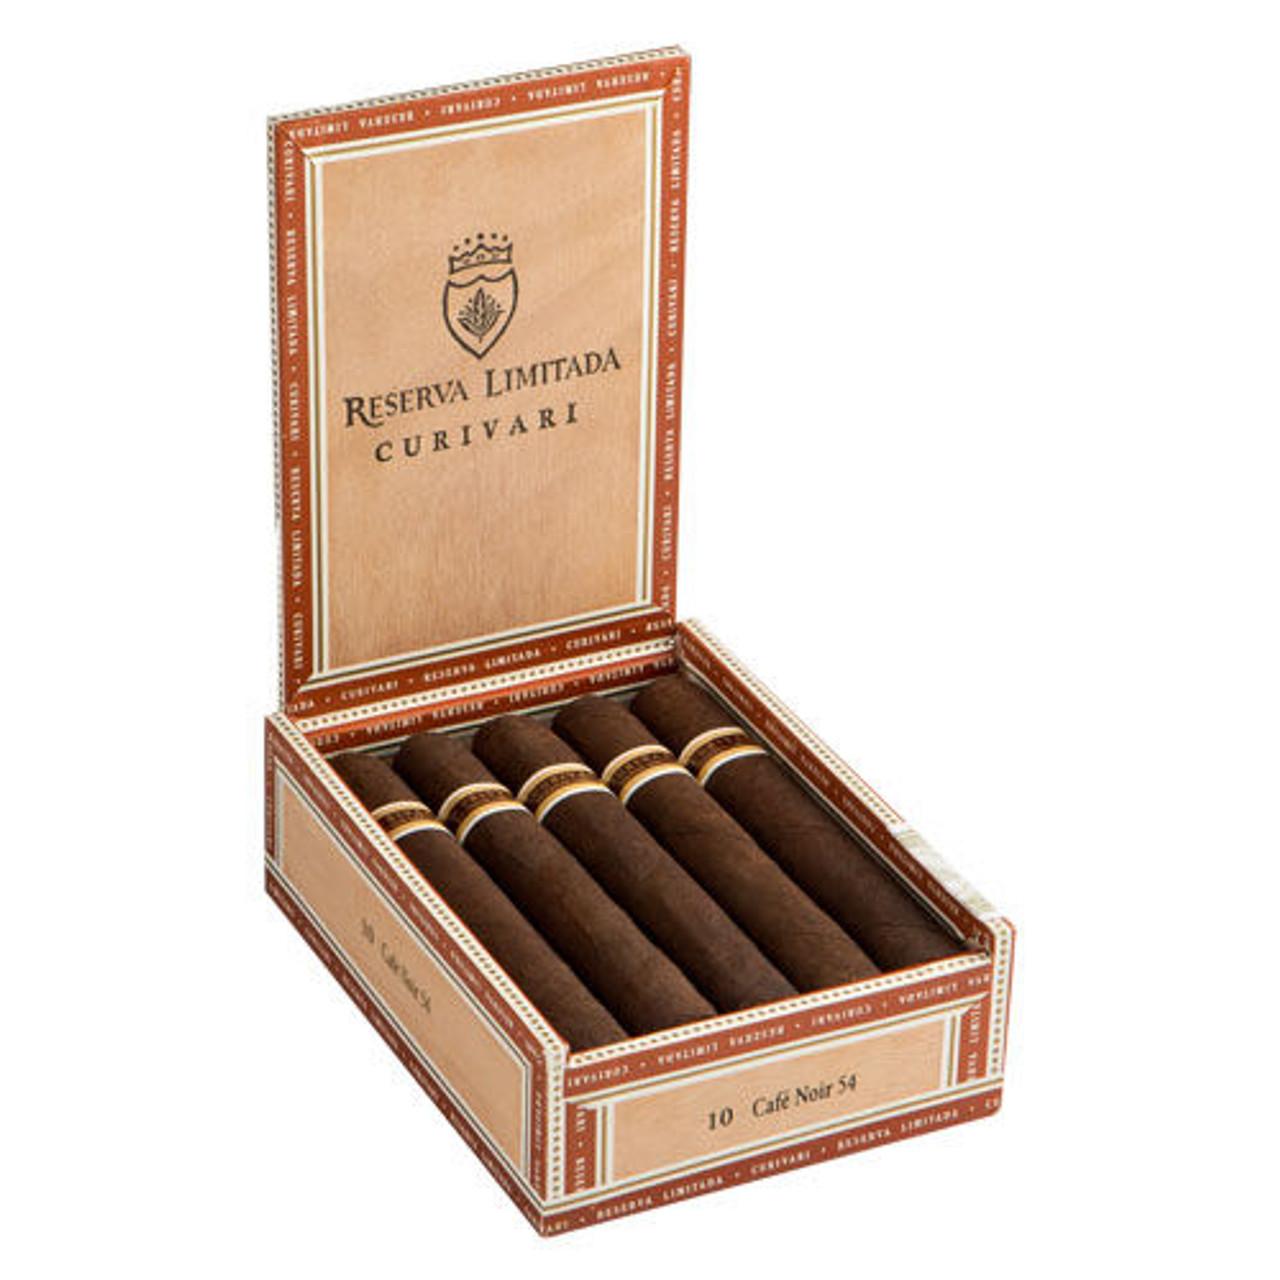 Curivari Reserva Limitada Cafe Noir Café Noir 56 Cigars - 5.5 x 56 (Box of 10)